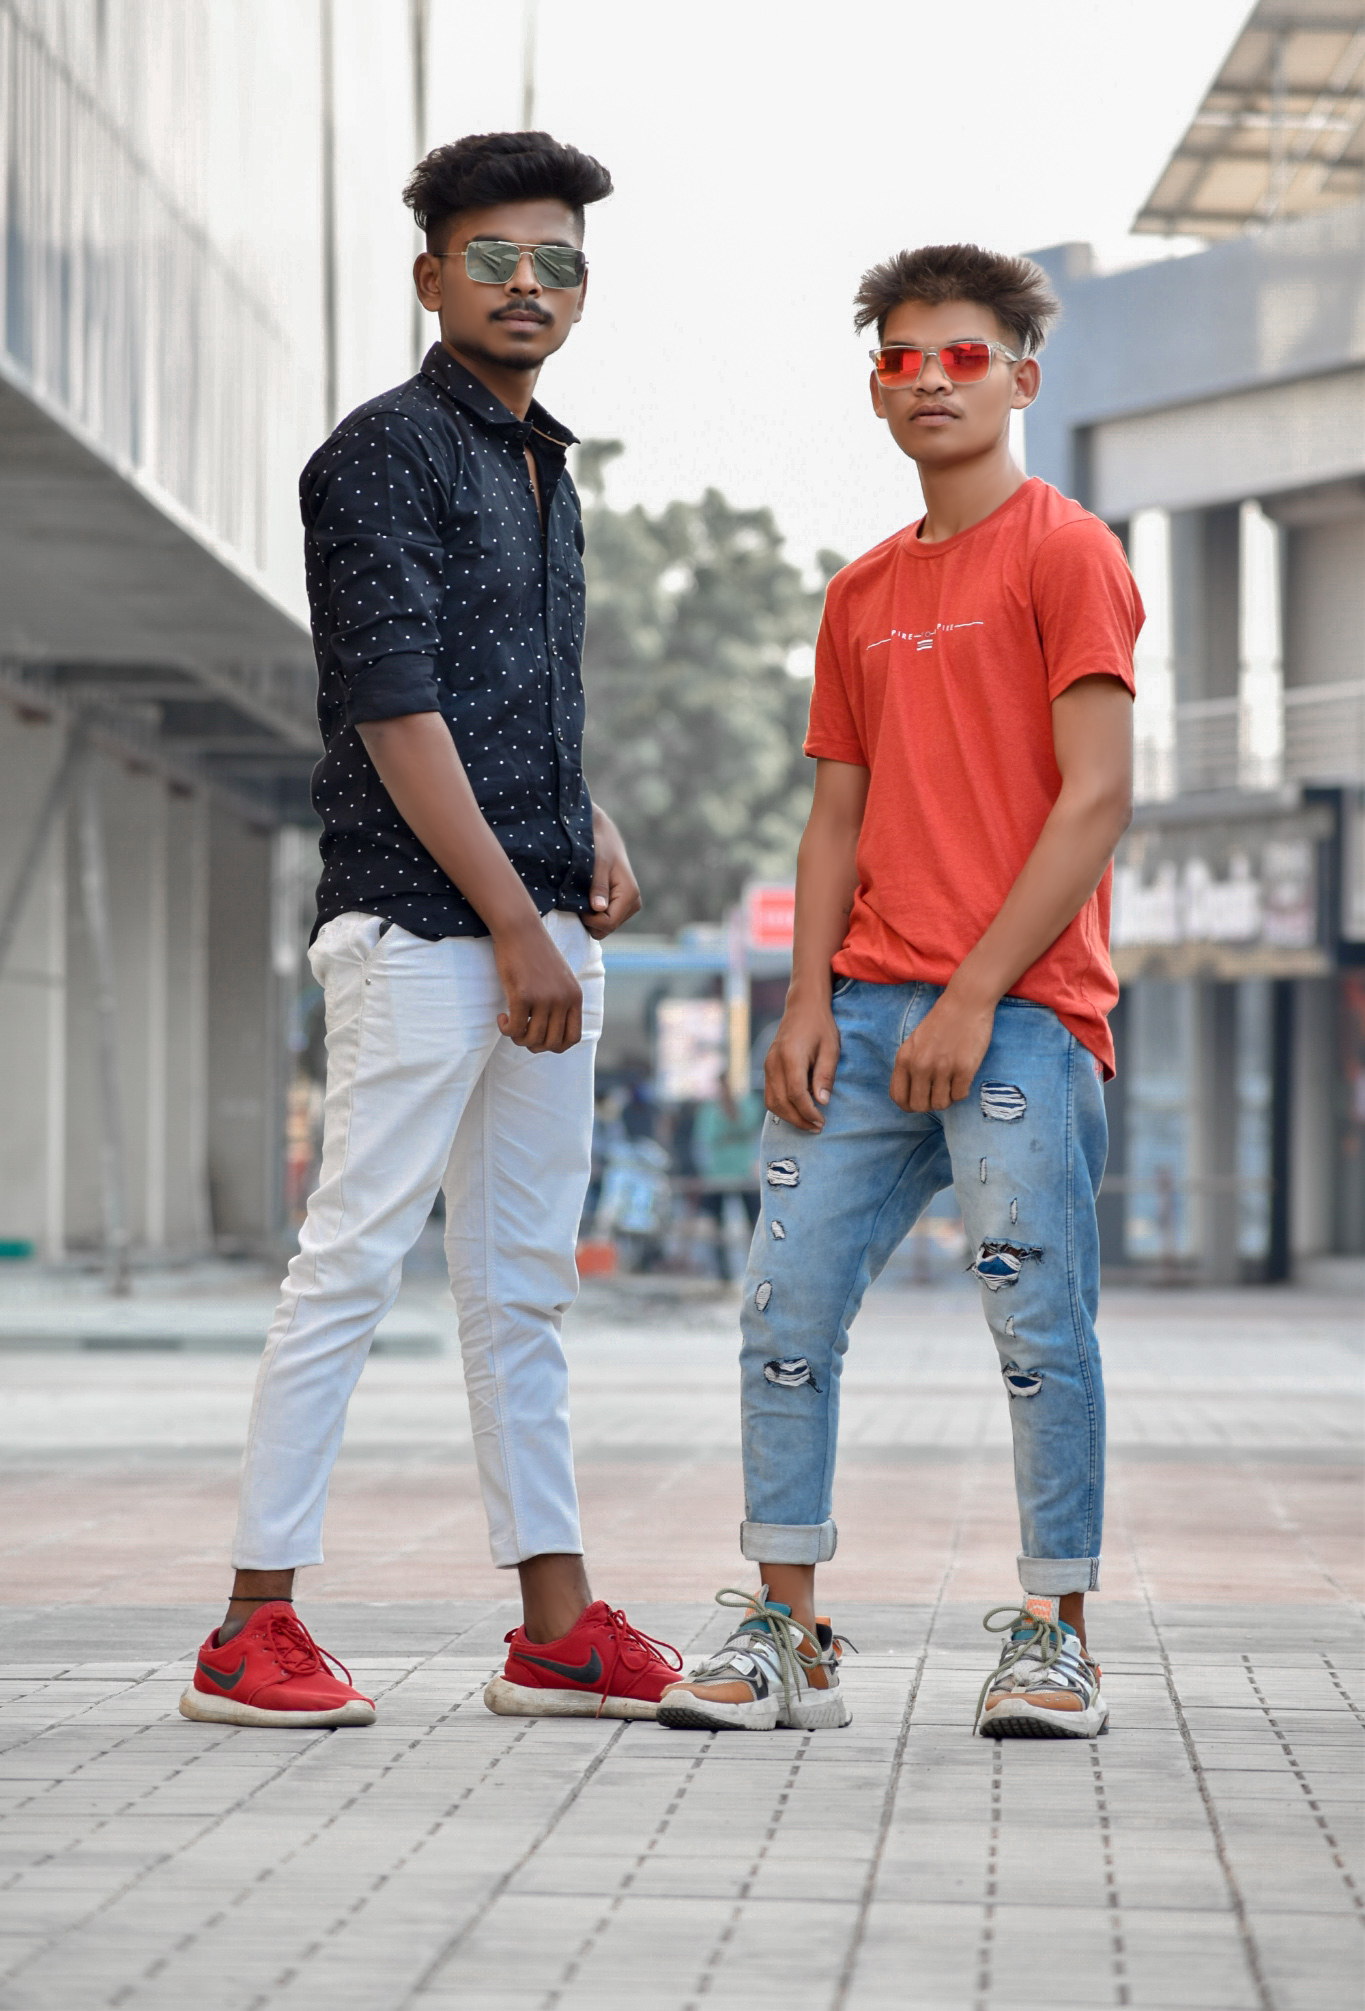 Two stylish boy